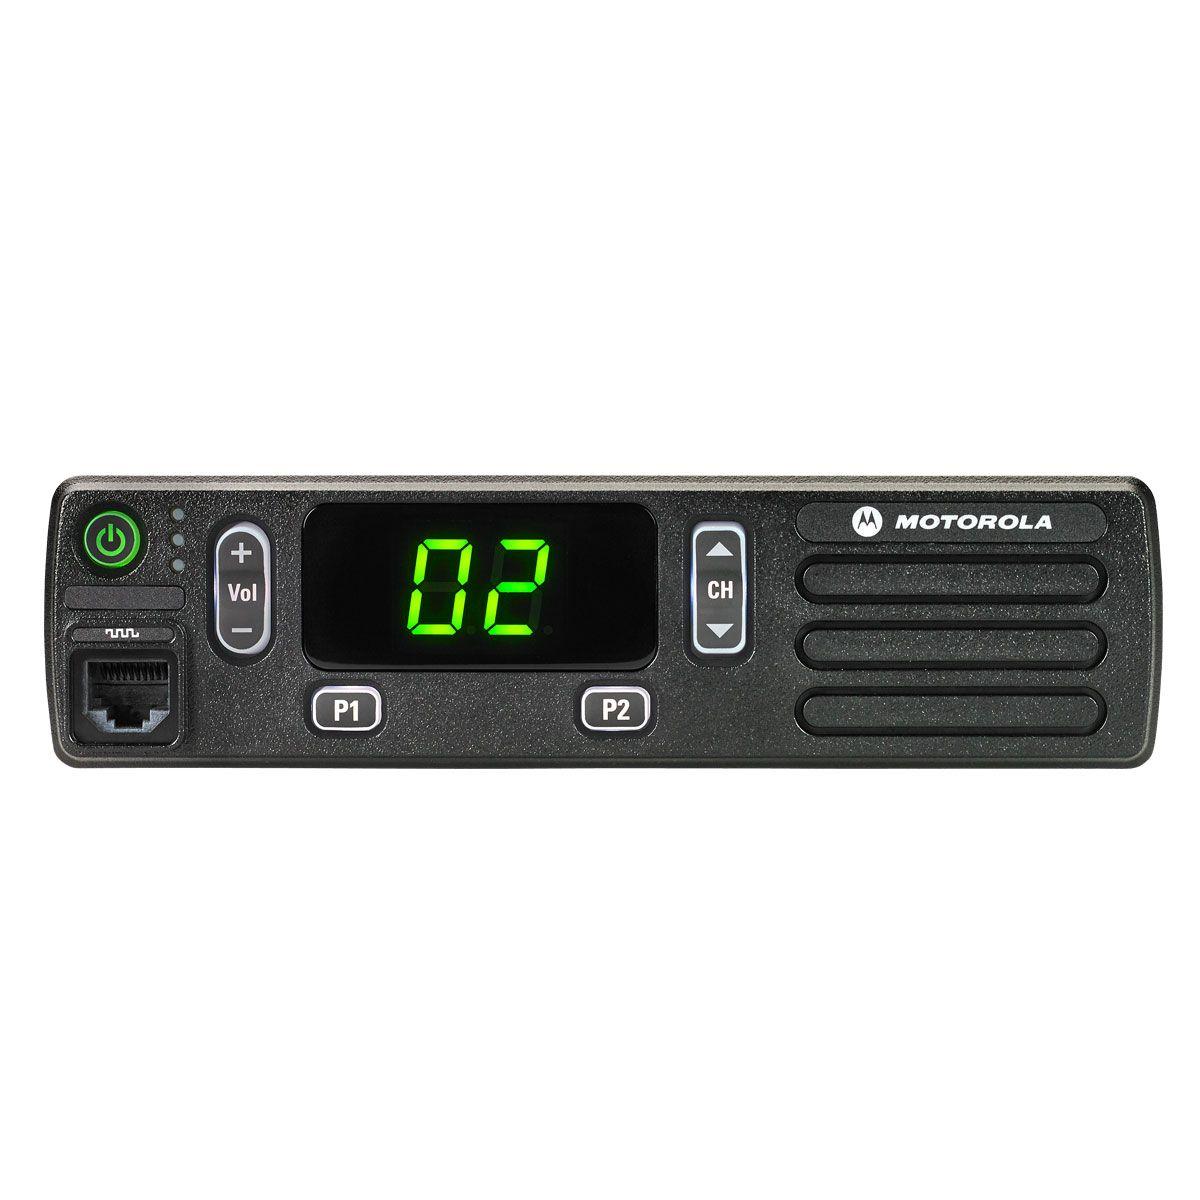 Radio Motorola DEM300 Digital LAM01JQC9JA1AN VHF 136-174 MHZ de 45W